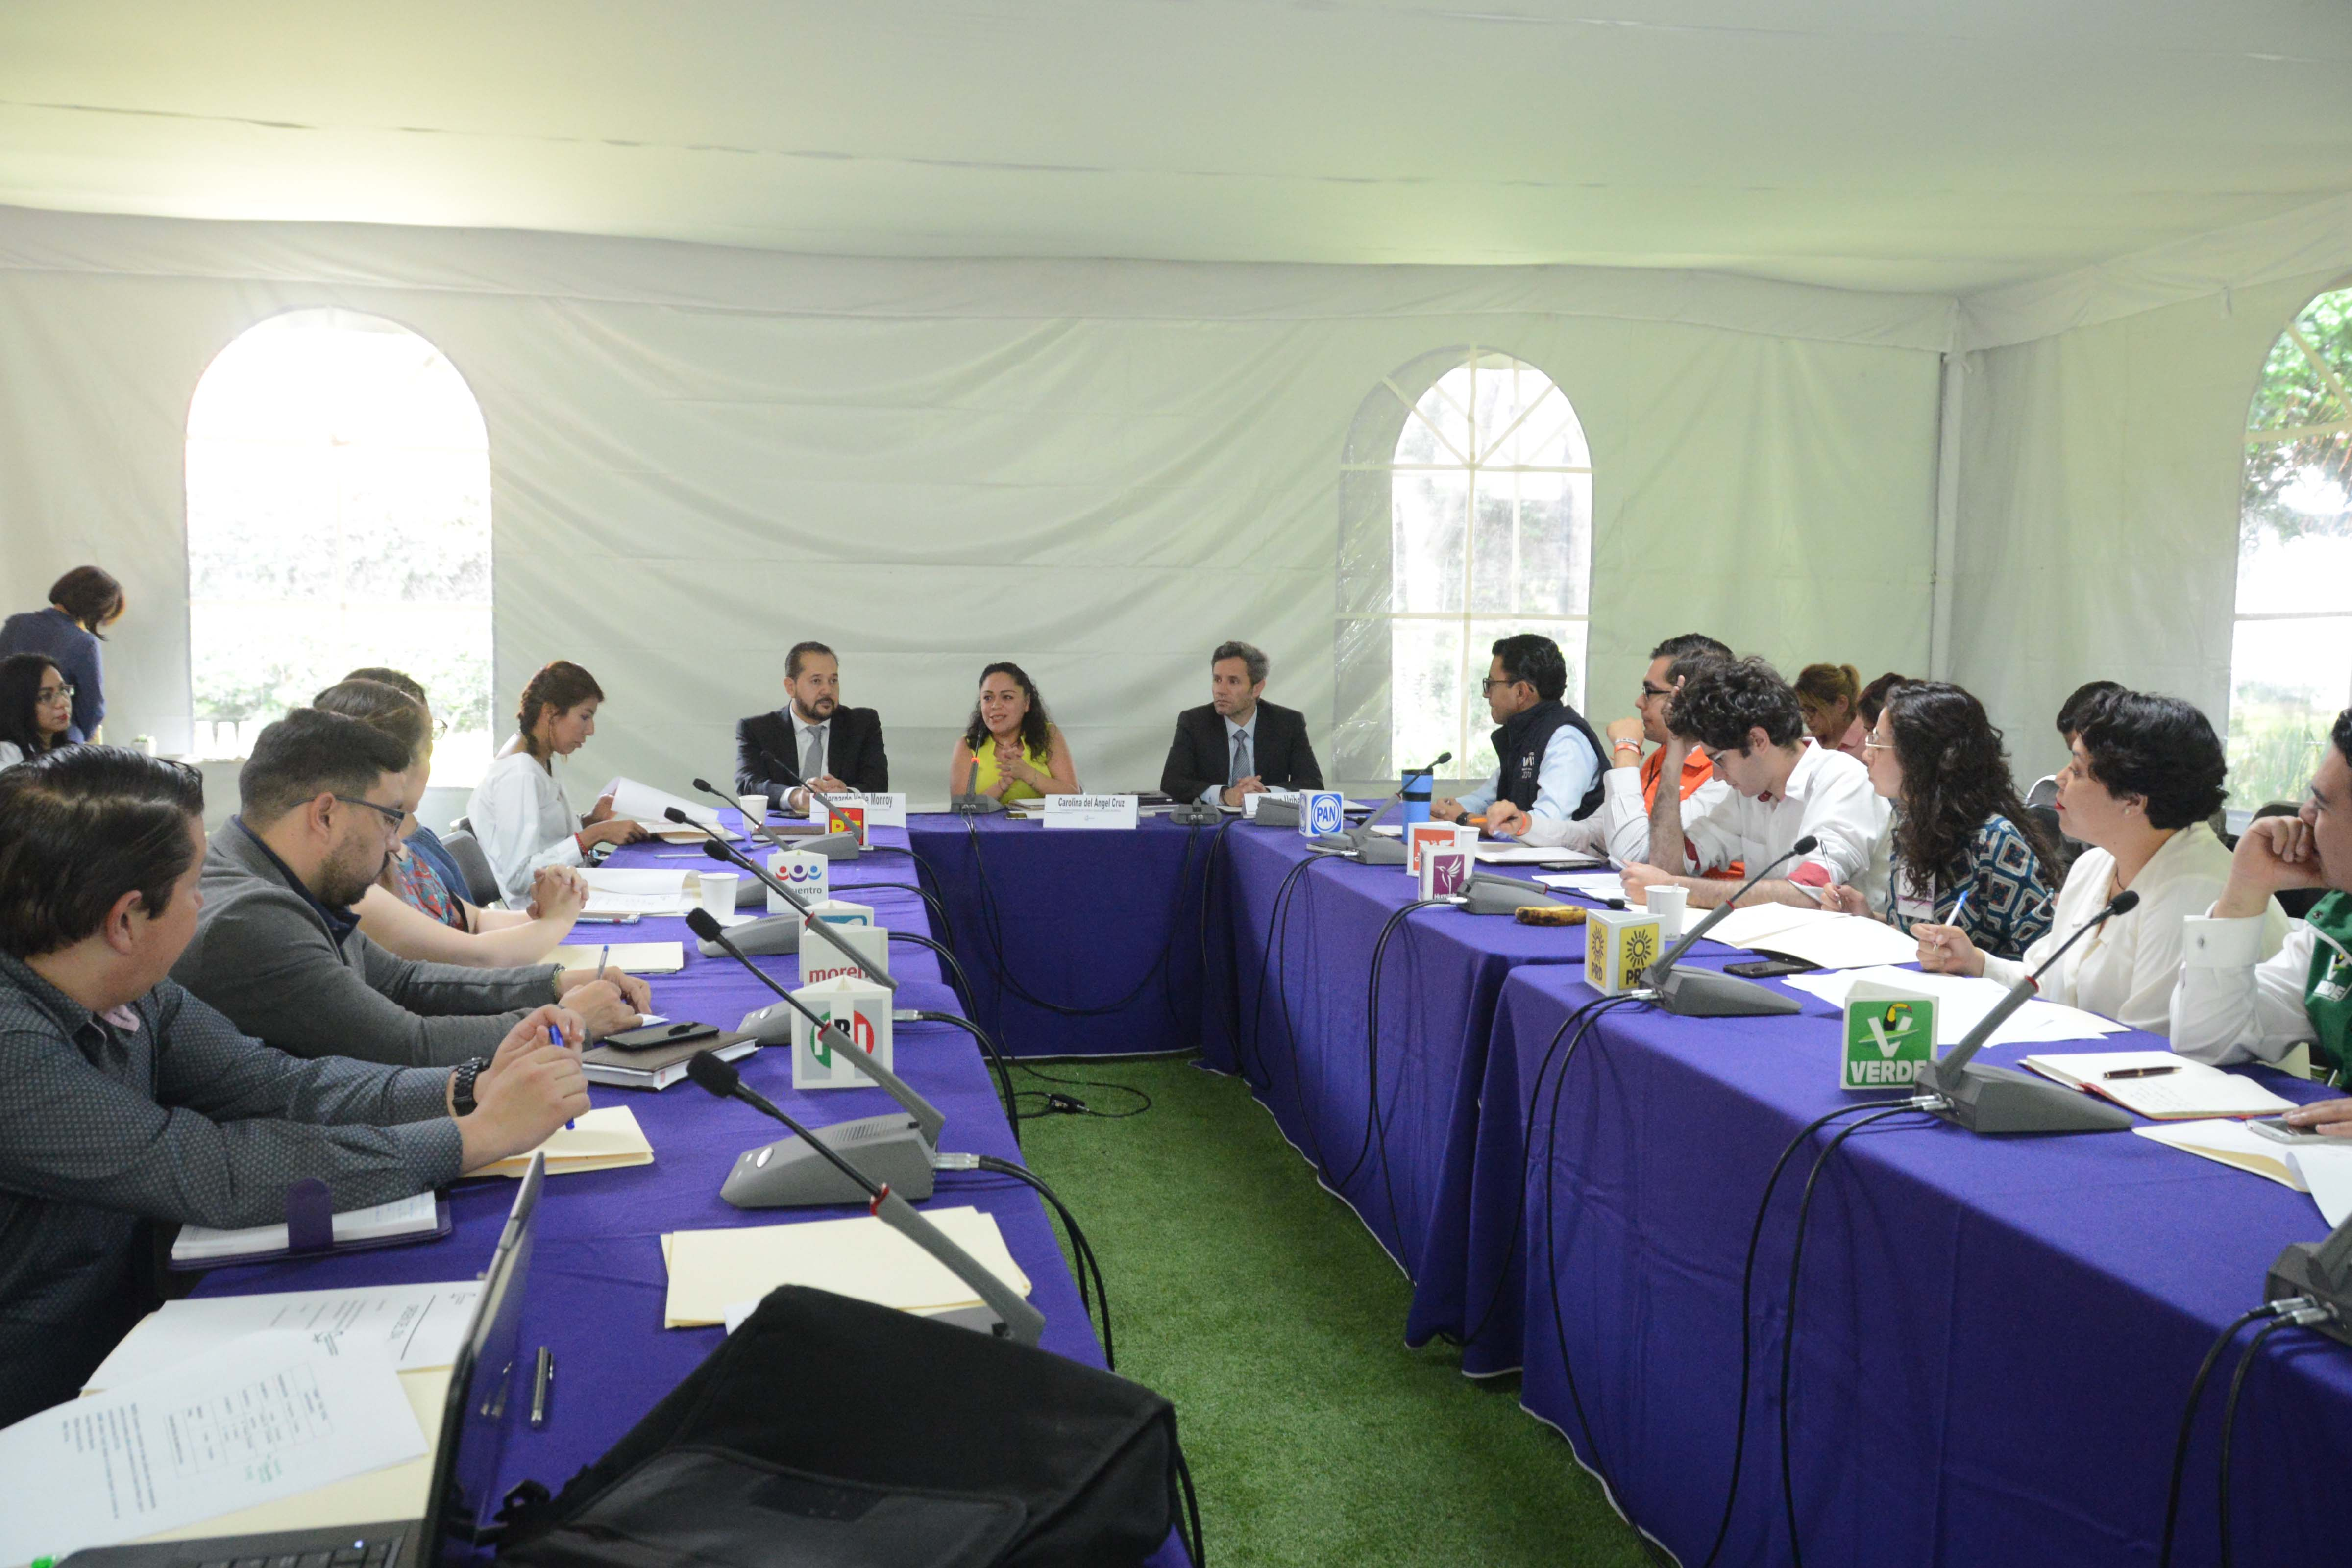 Organiza IECM intercambio de ideas entre representantes de grupos juveniles de los partidos políticos